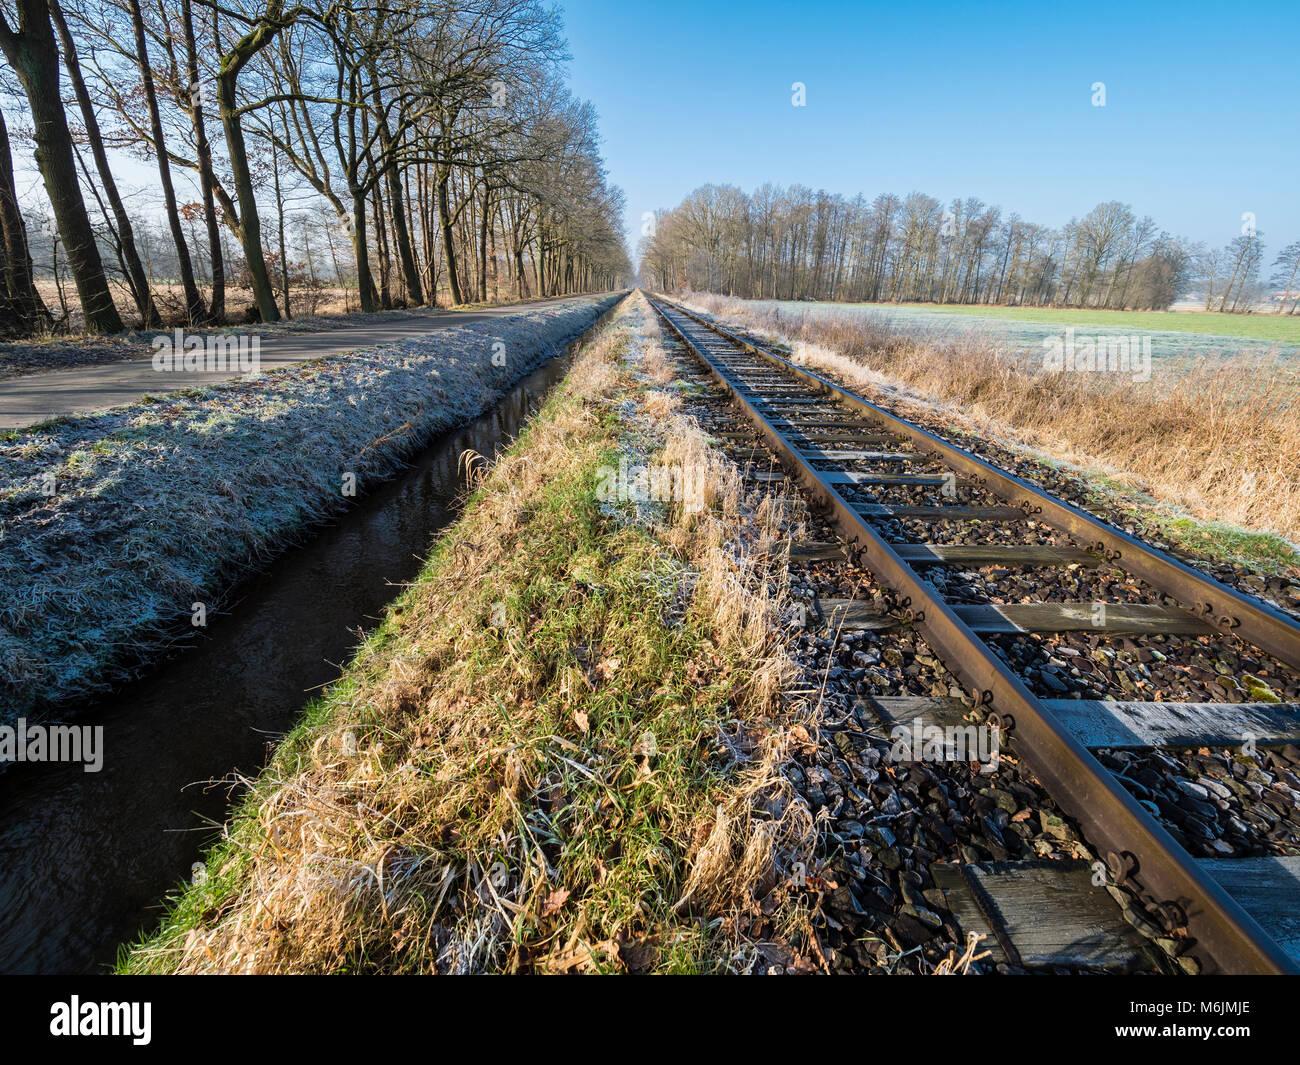 Railroad tracks of the OHE,  Osthannoversche Eisenbahnen, winter day, rural road, railway network, Lachtehausen, Stock Photo